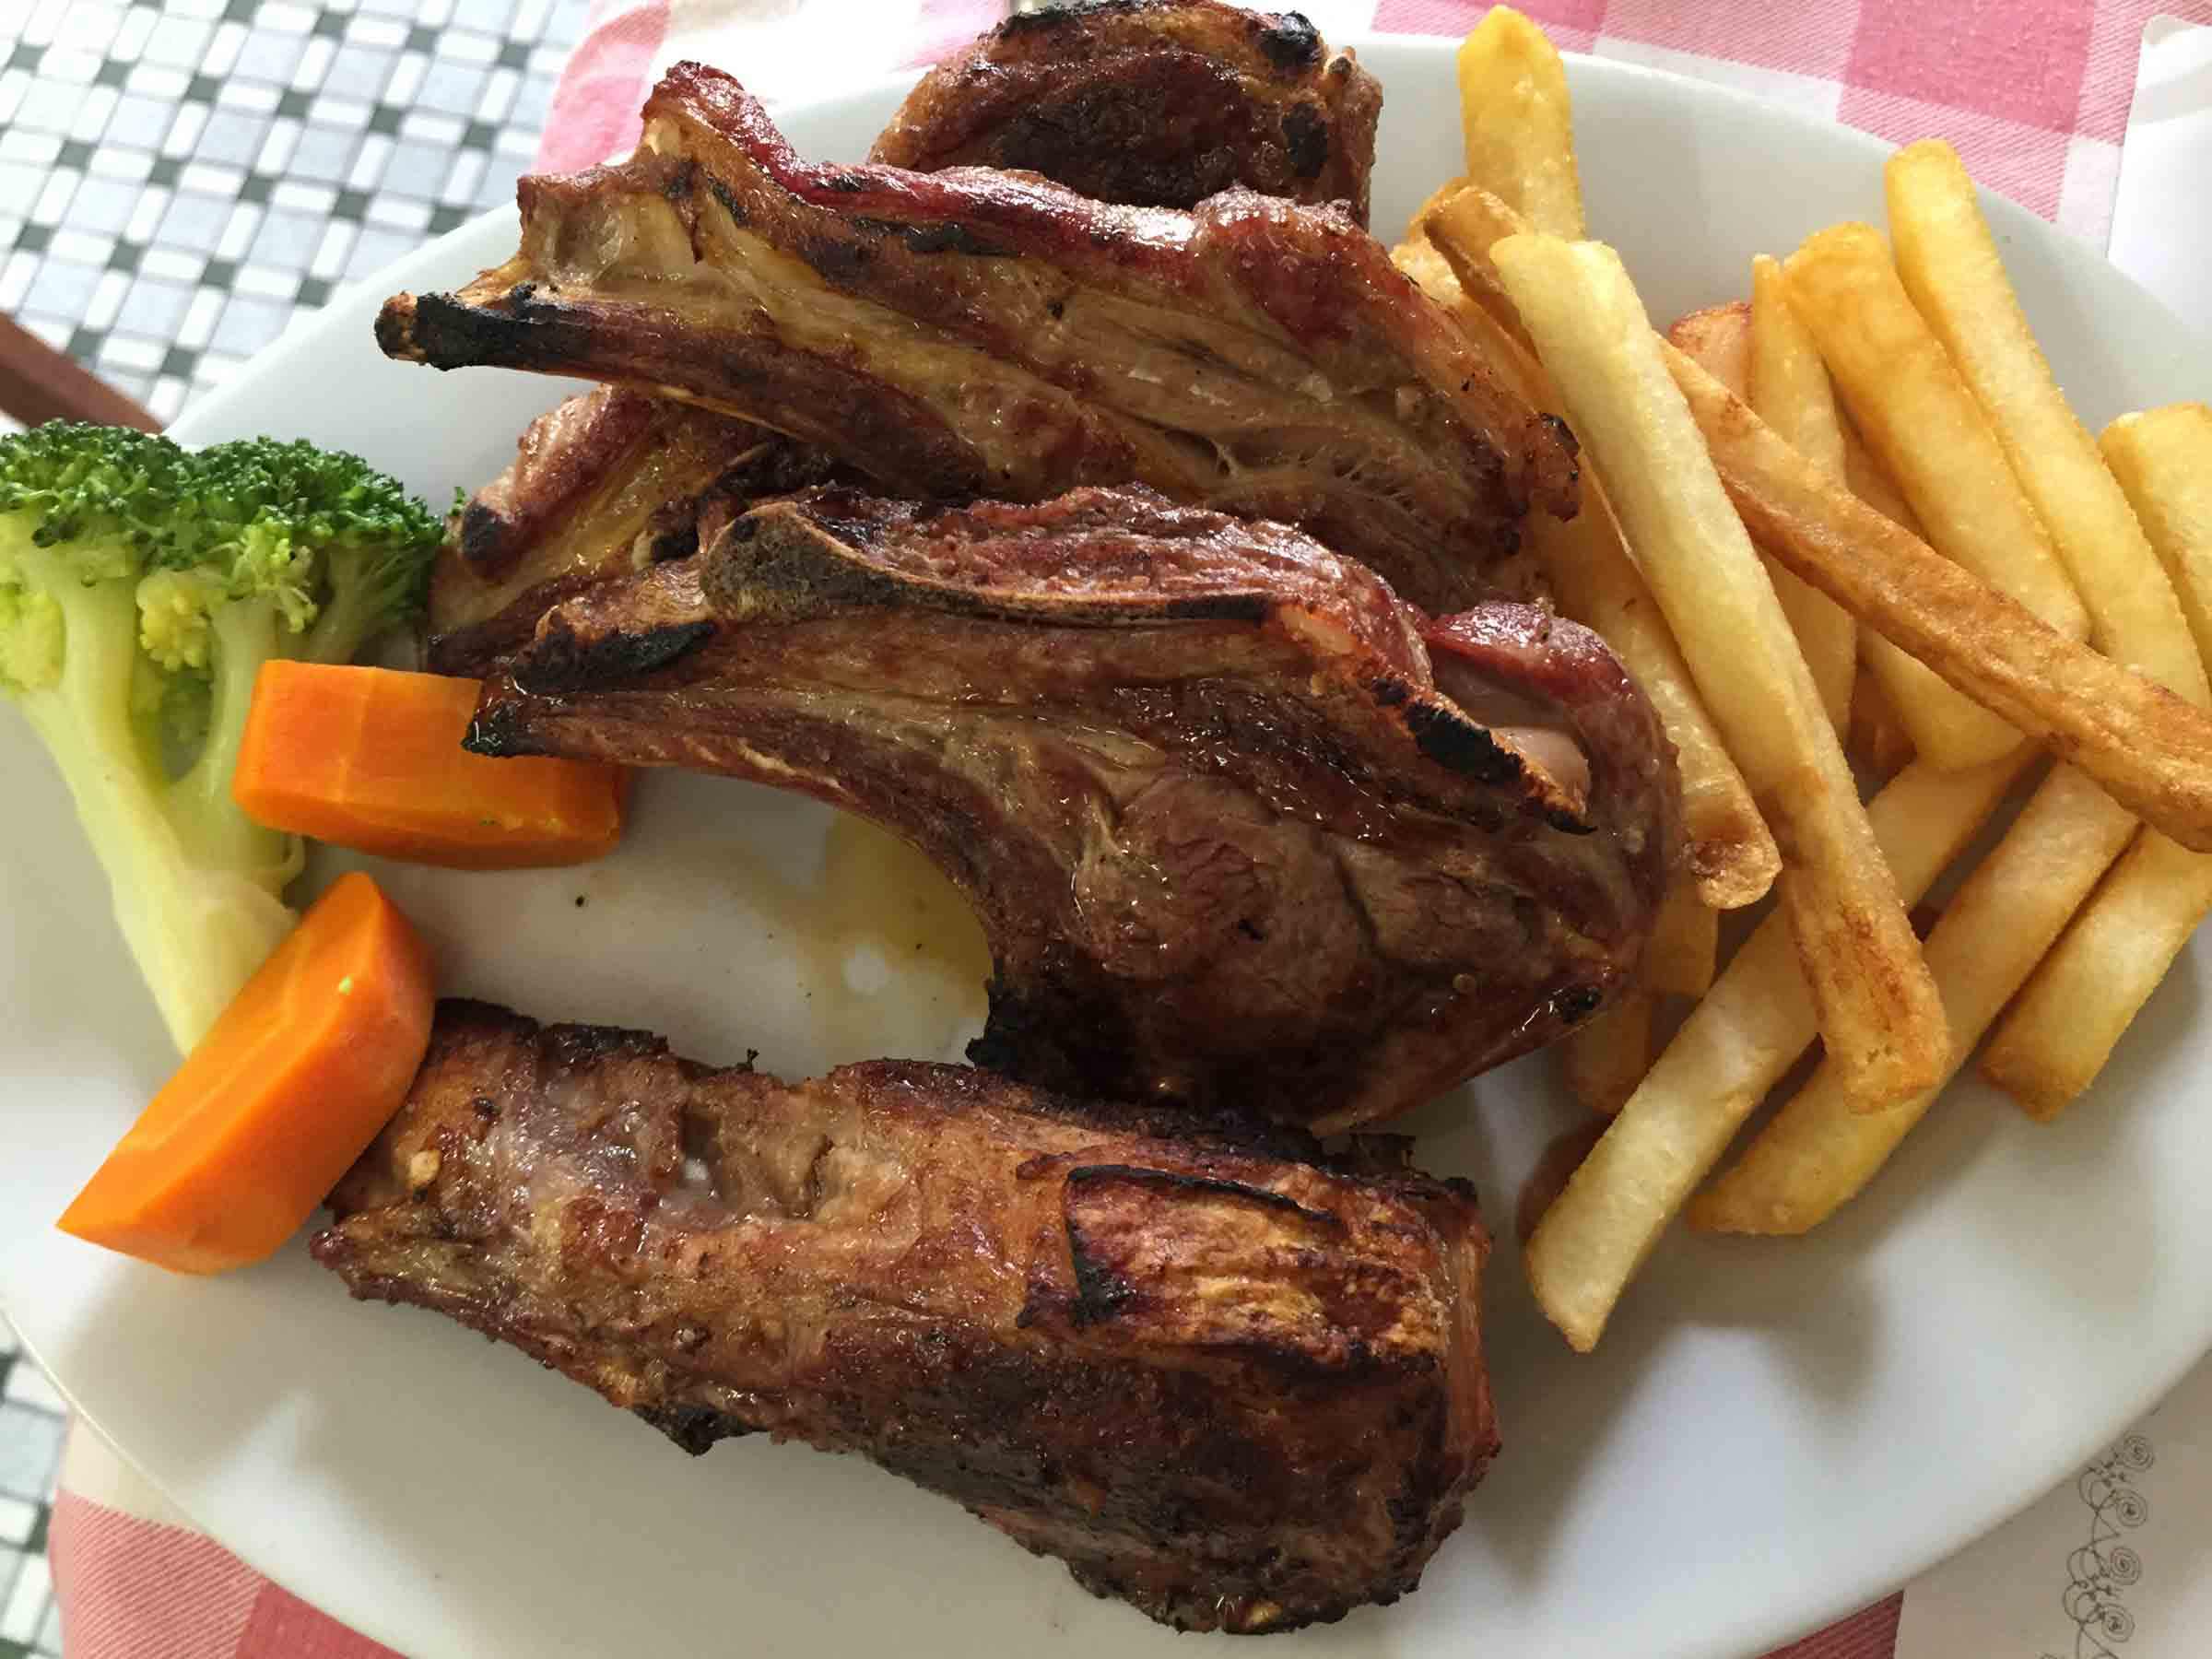 Best Macau Restaurants: Lamb Chops at A Petisqueira